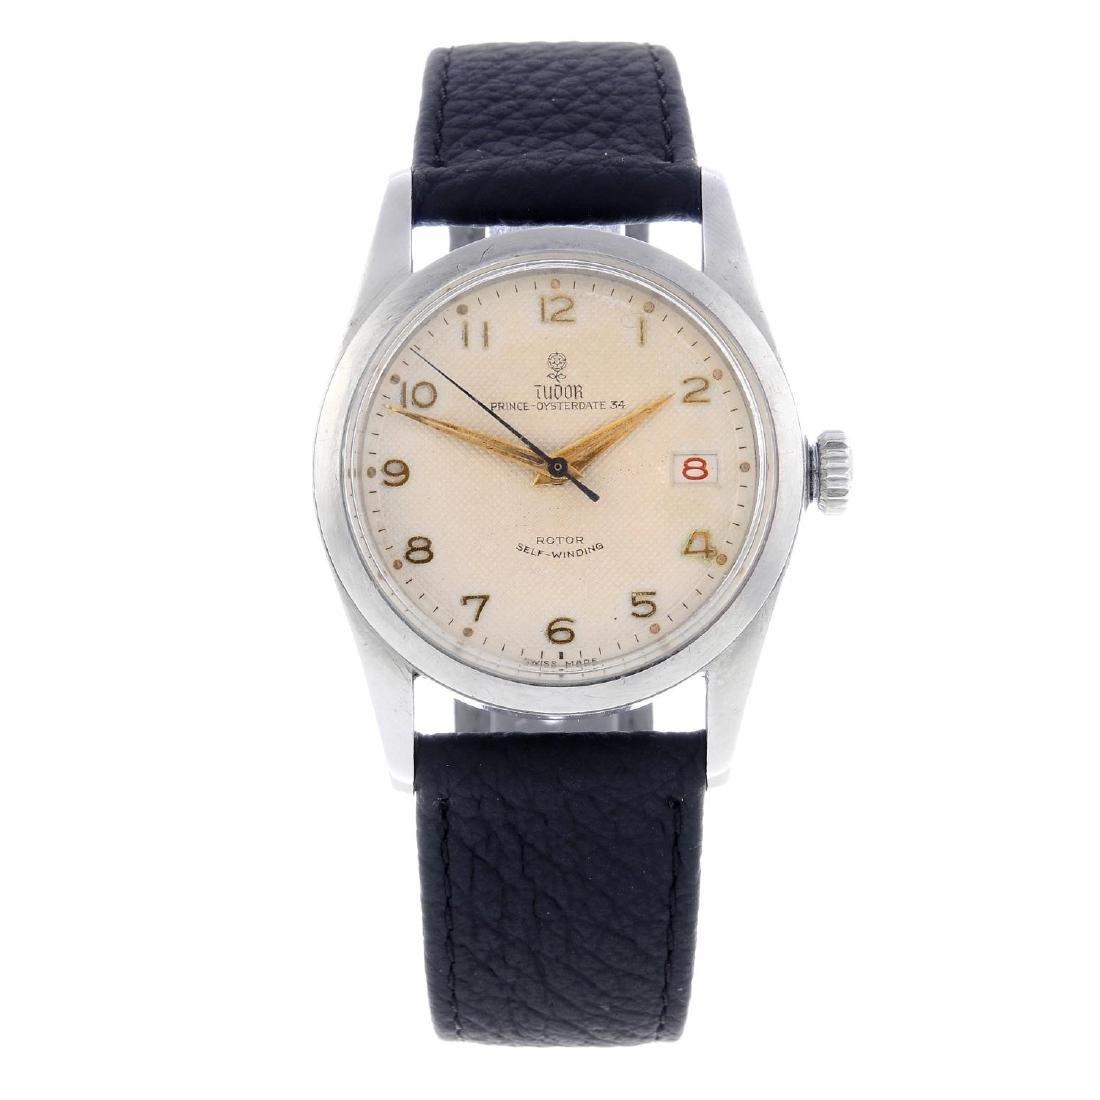 TUDOR - a gentleman's Prince Oysterdate 34 wrist watch.